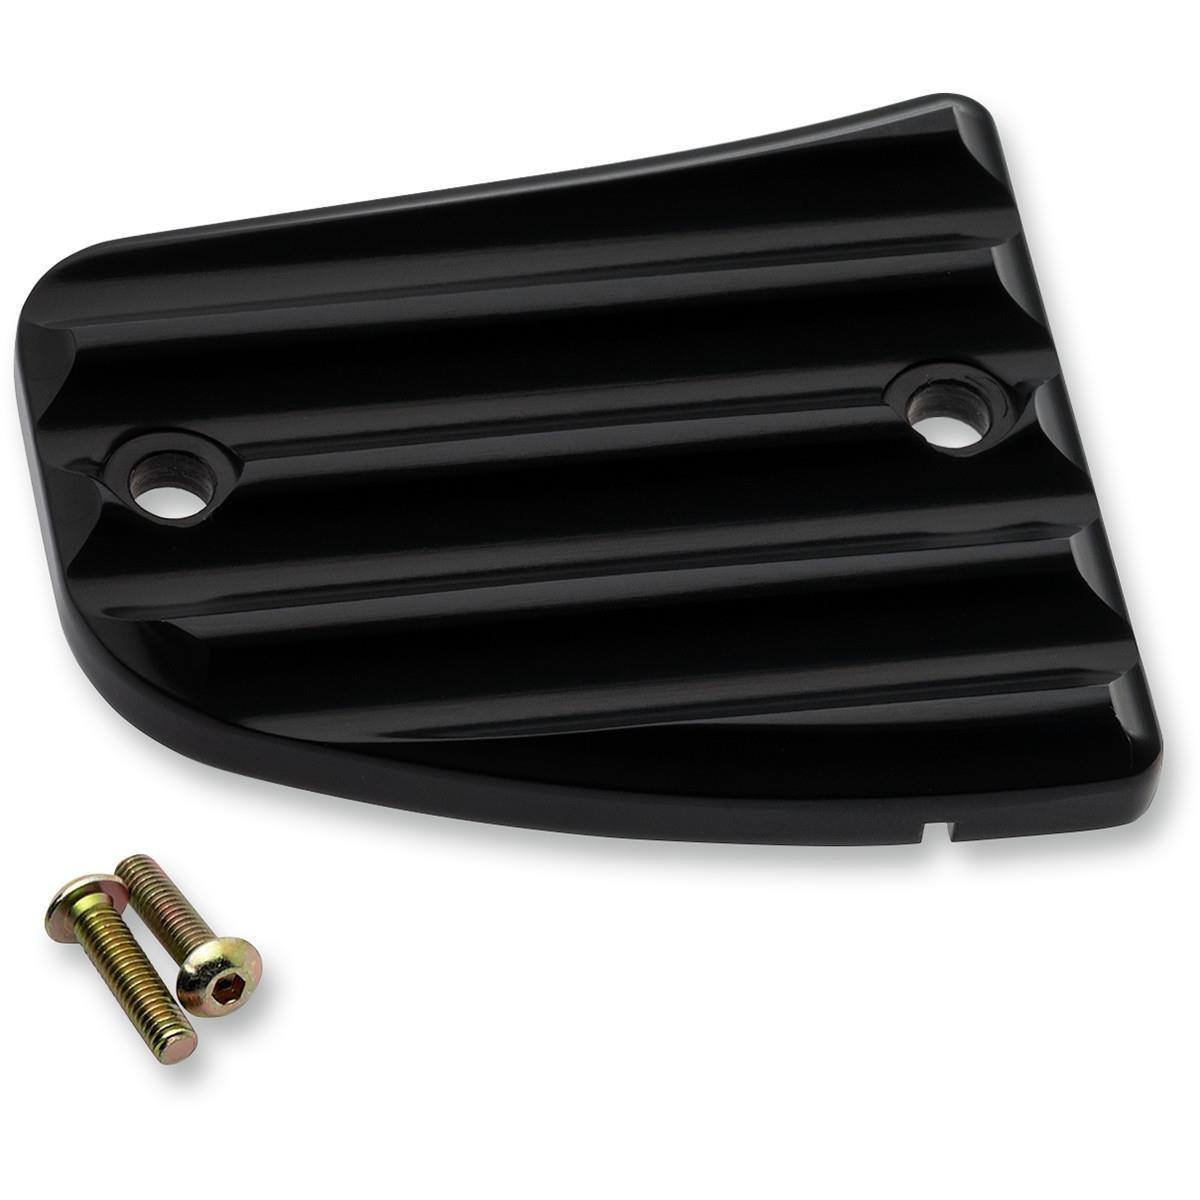 Joker Machine 30-380-1 Front Brake Master Cylinder Cover - Finned - Black Anodized